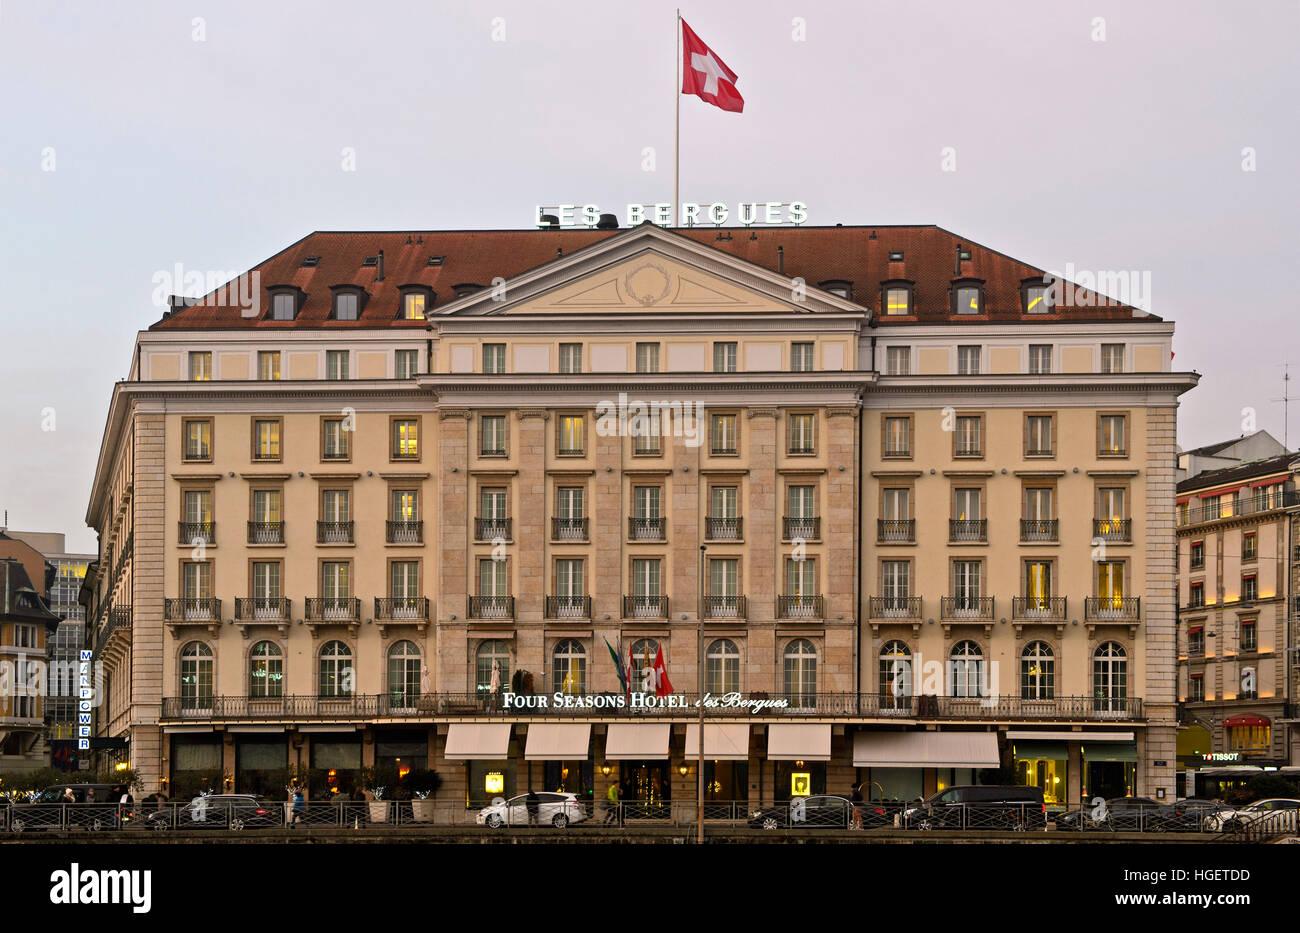 Four Seasons Hotel des Bergues on an evening in December, Geneva, Switzerland Stock Photo